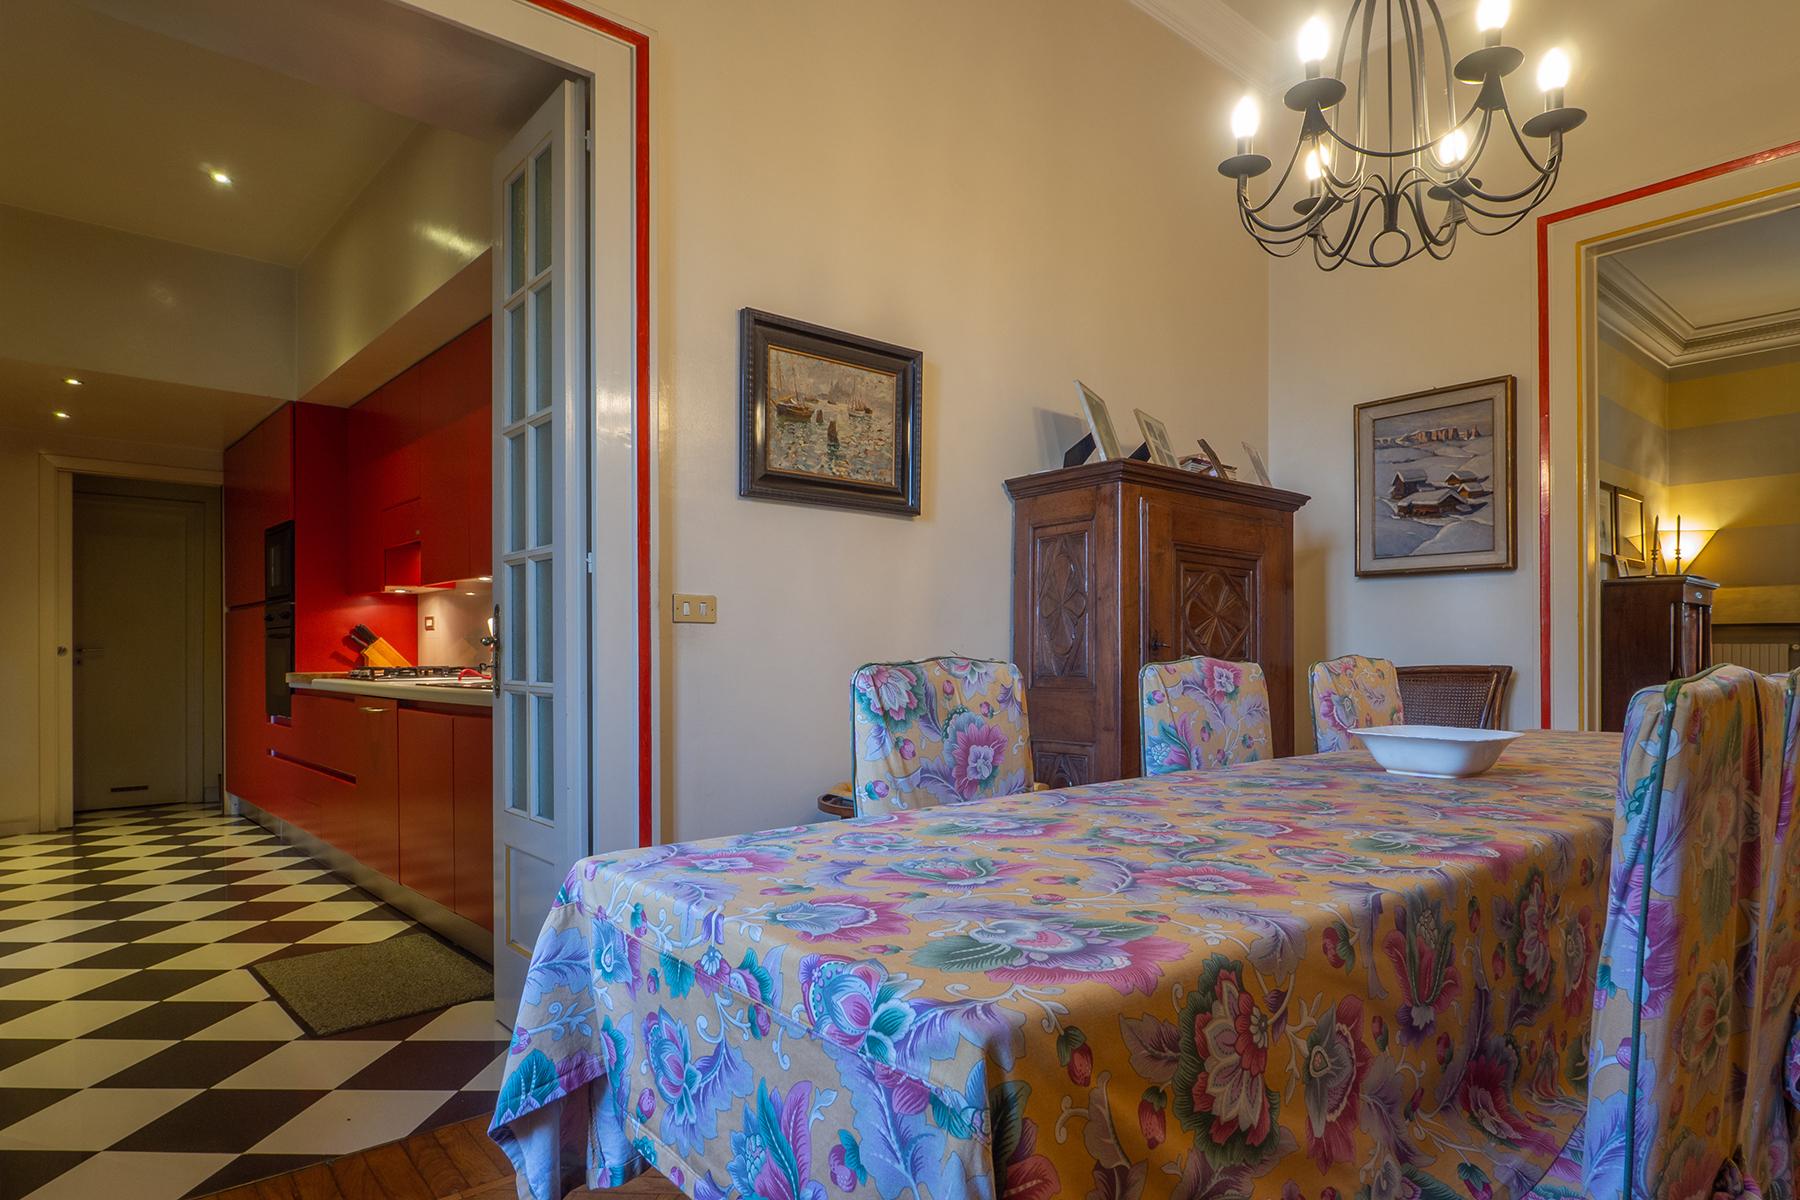 Casa indipendente in Vendita a Torino: 5 locali, 657 mq - Foto 11